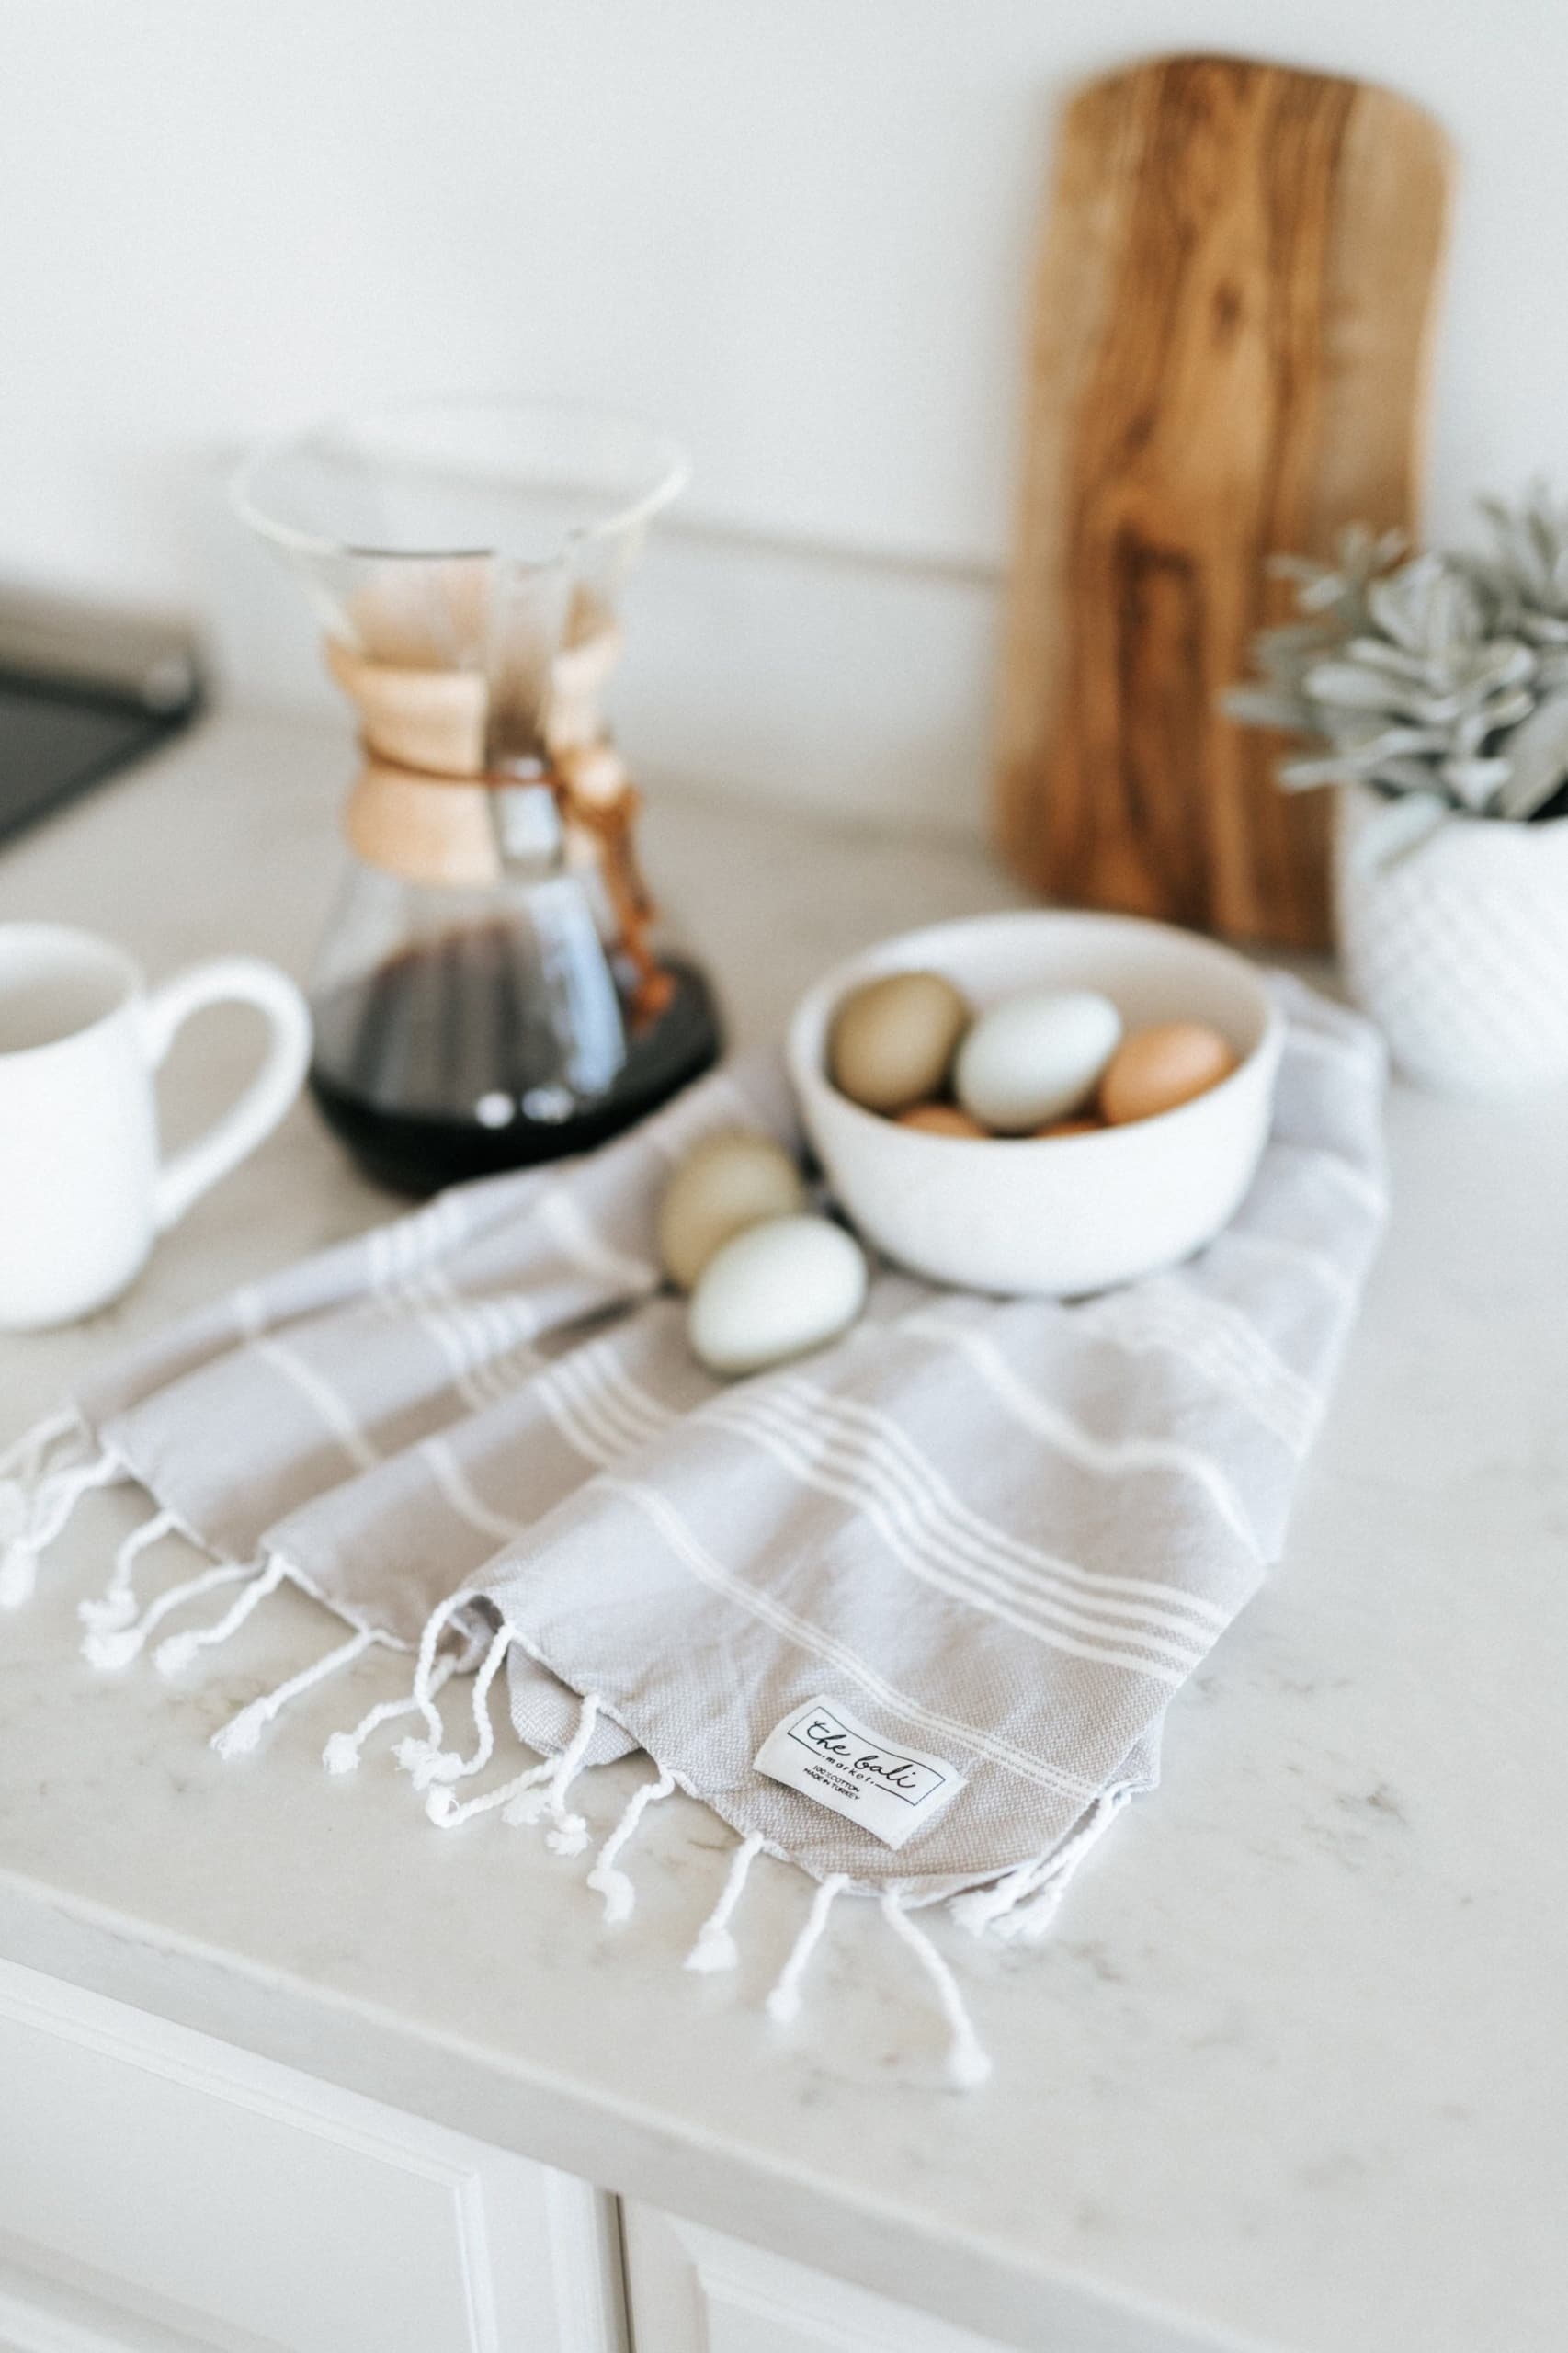 kitchen tea towel styling grey and wipe stripe